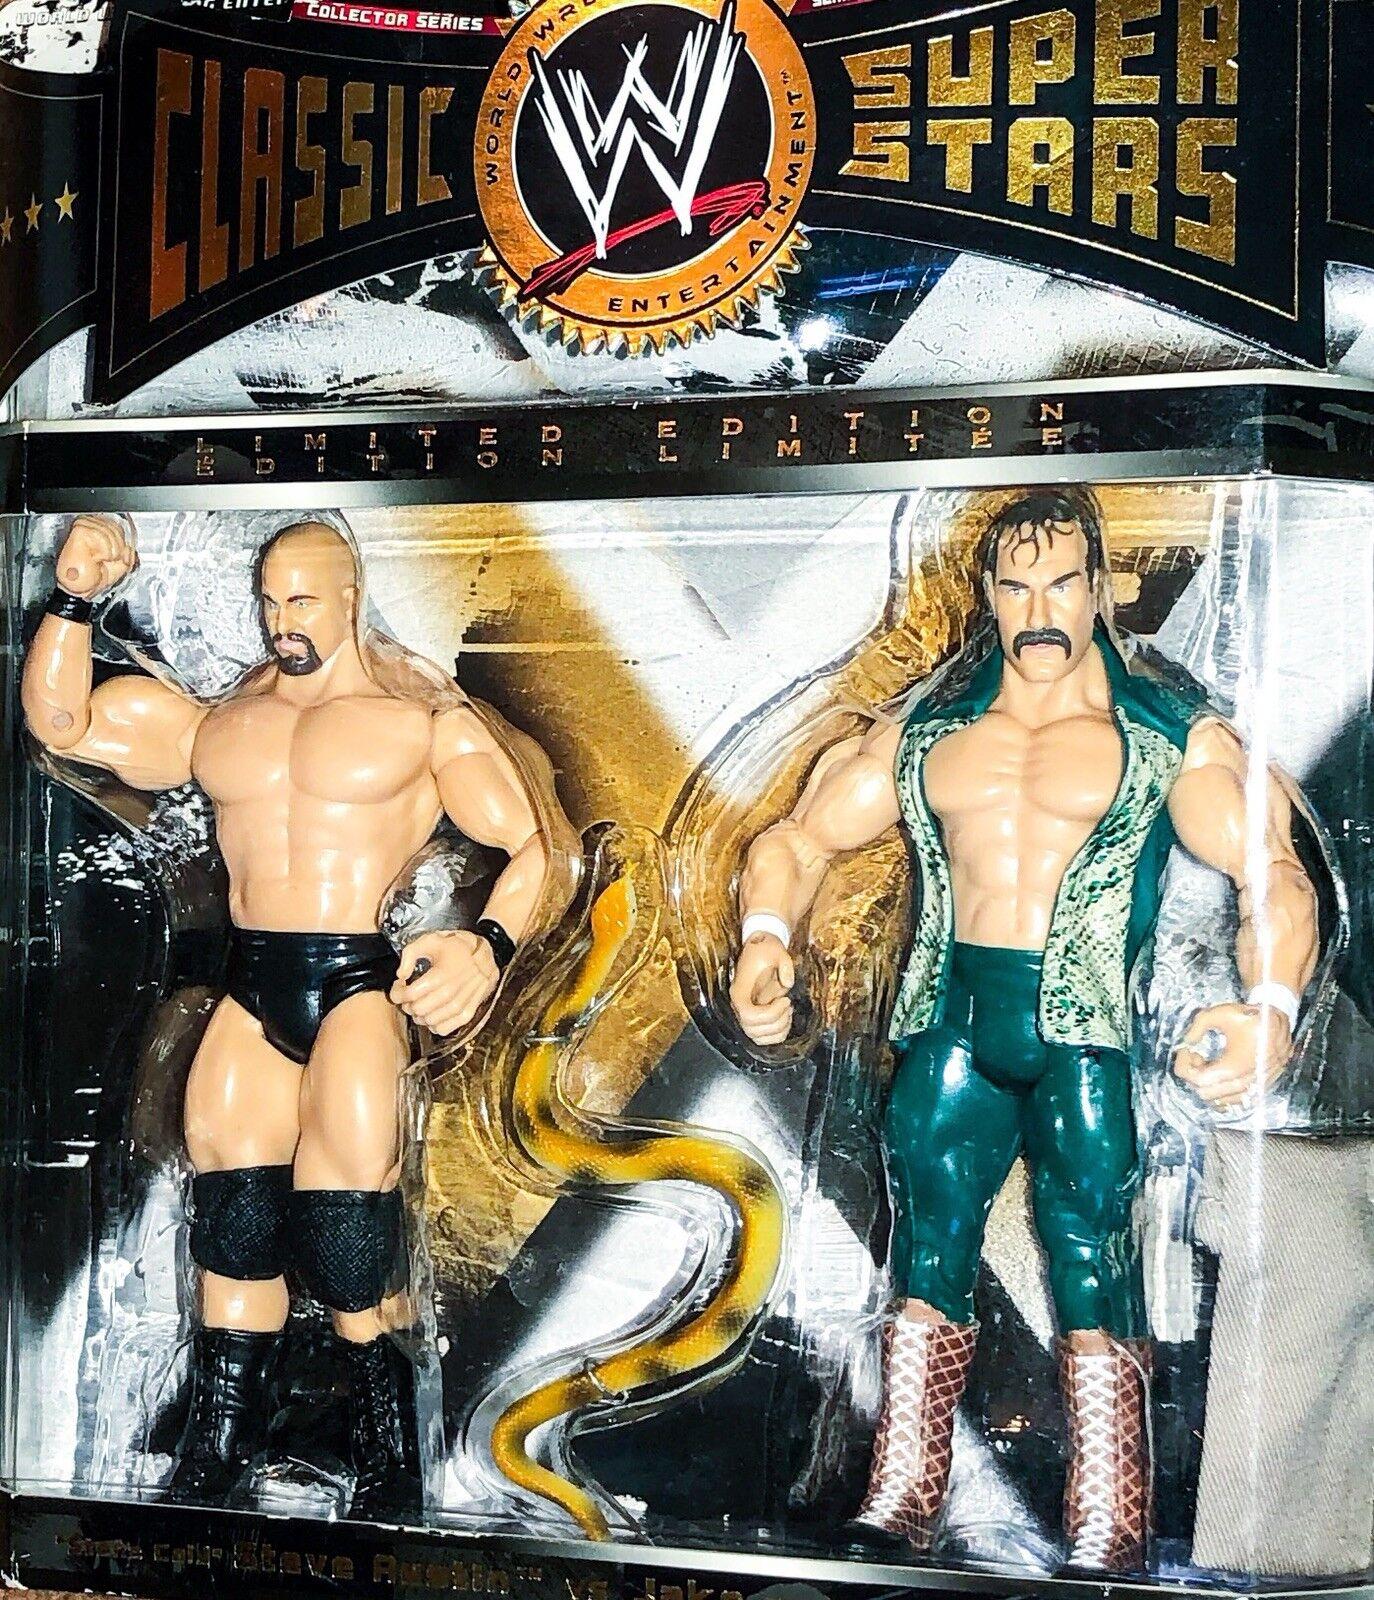 STONE COLD 3:16 Jake The Snake WWE WWF CLASSIC SUPERSTARS Wrestling Figure JAKKS